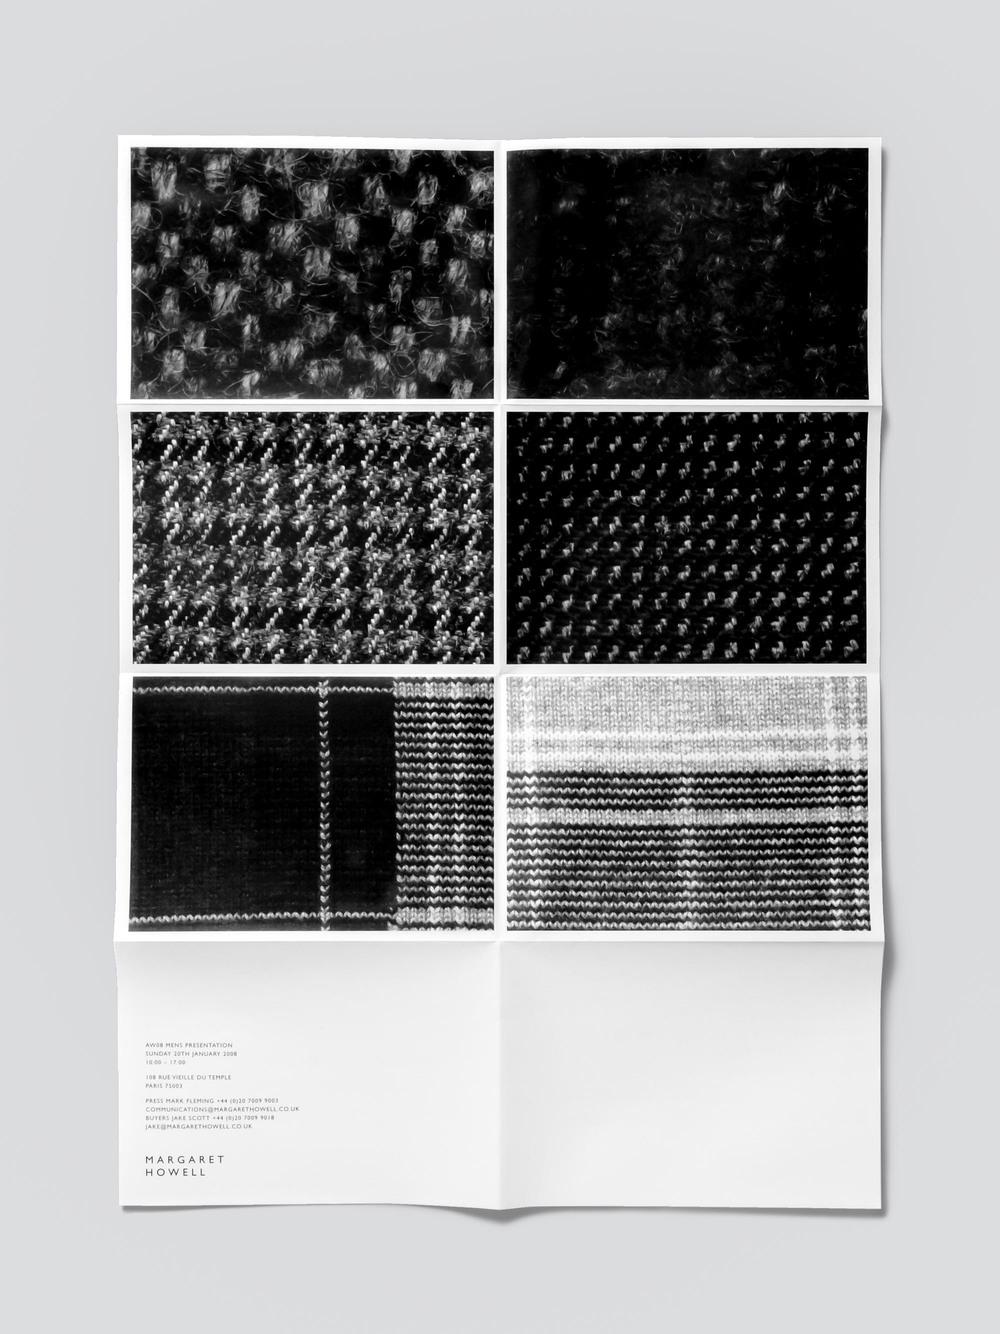 together-associates-studiosmall-margaret-howell-21.jpg